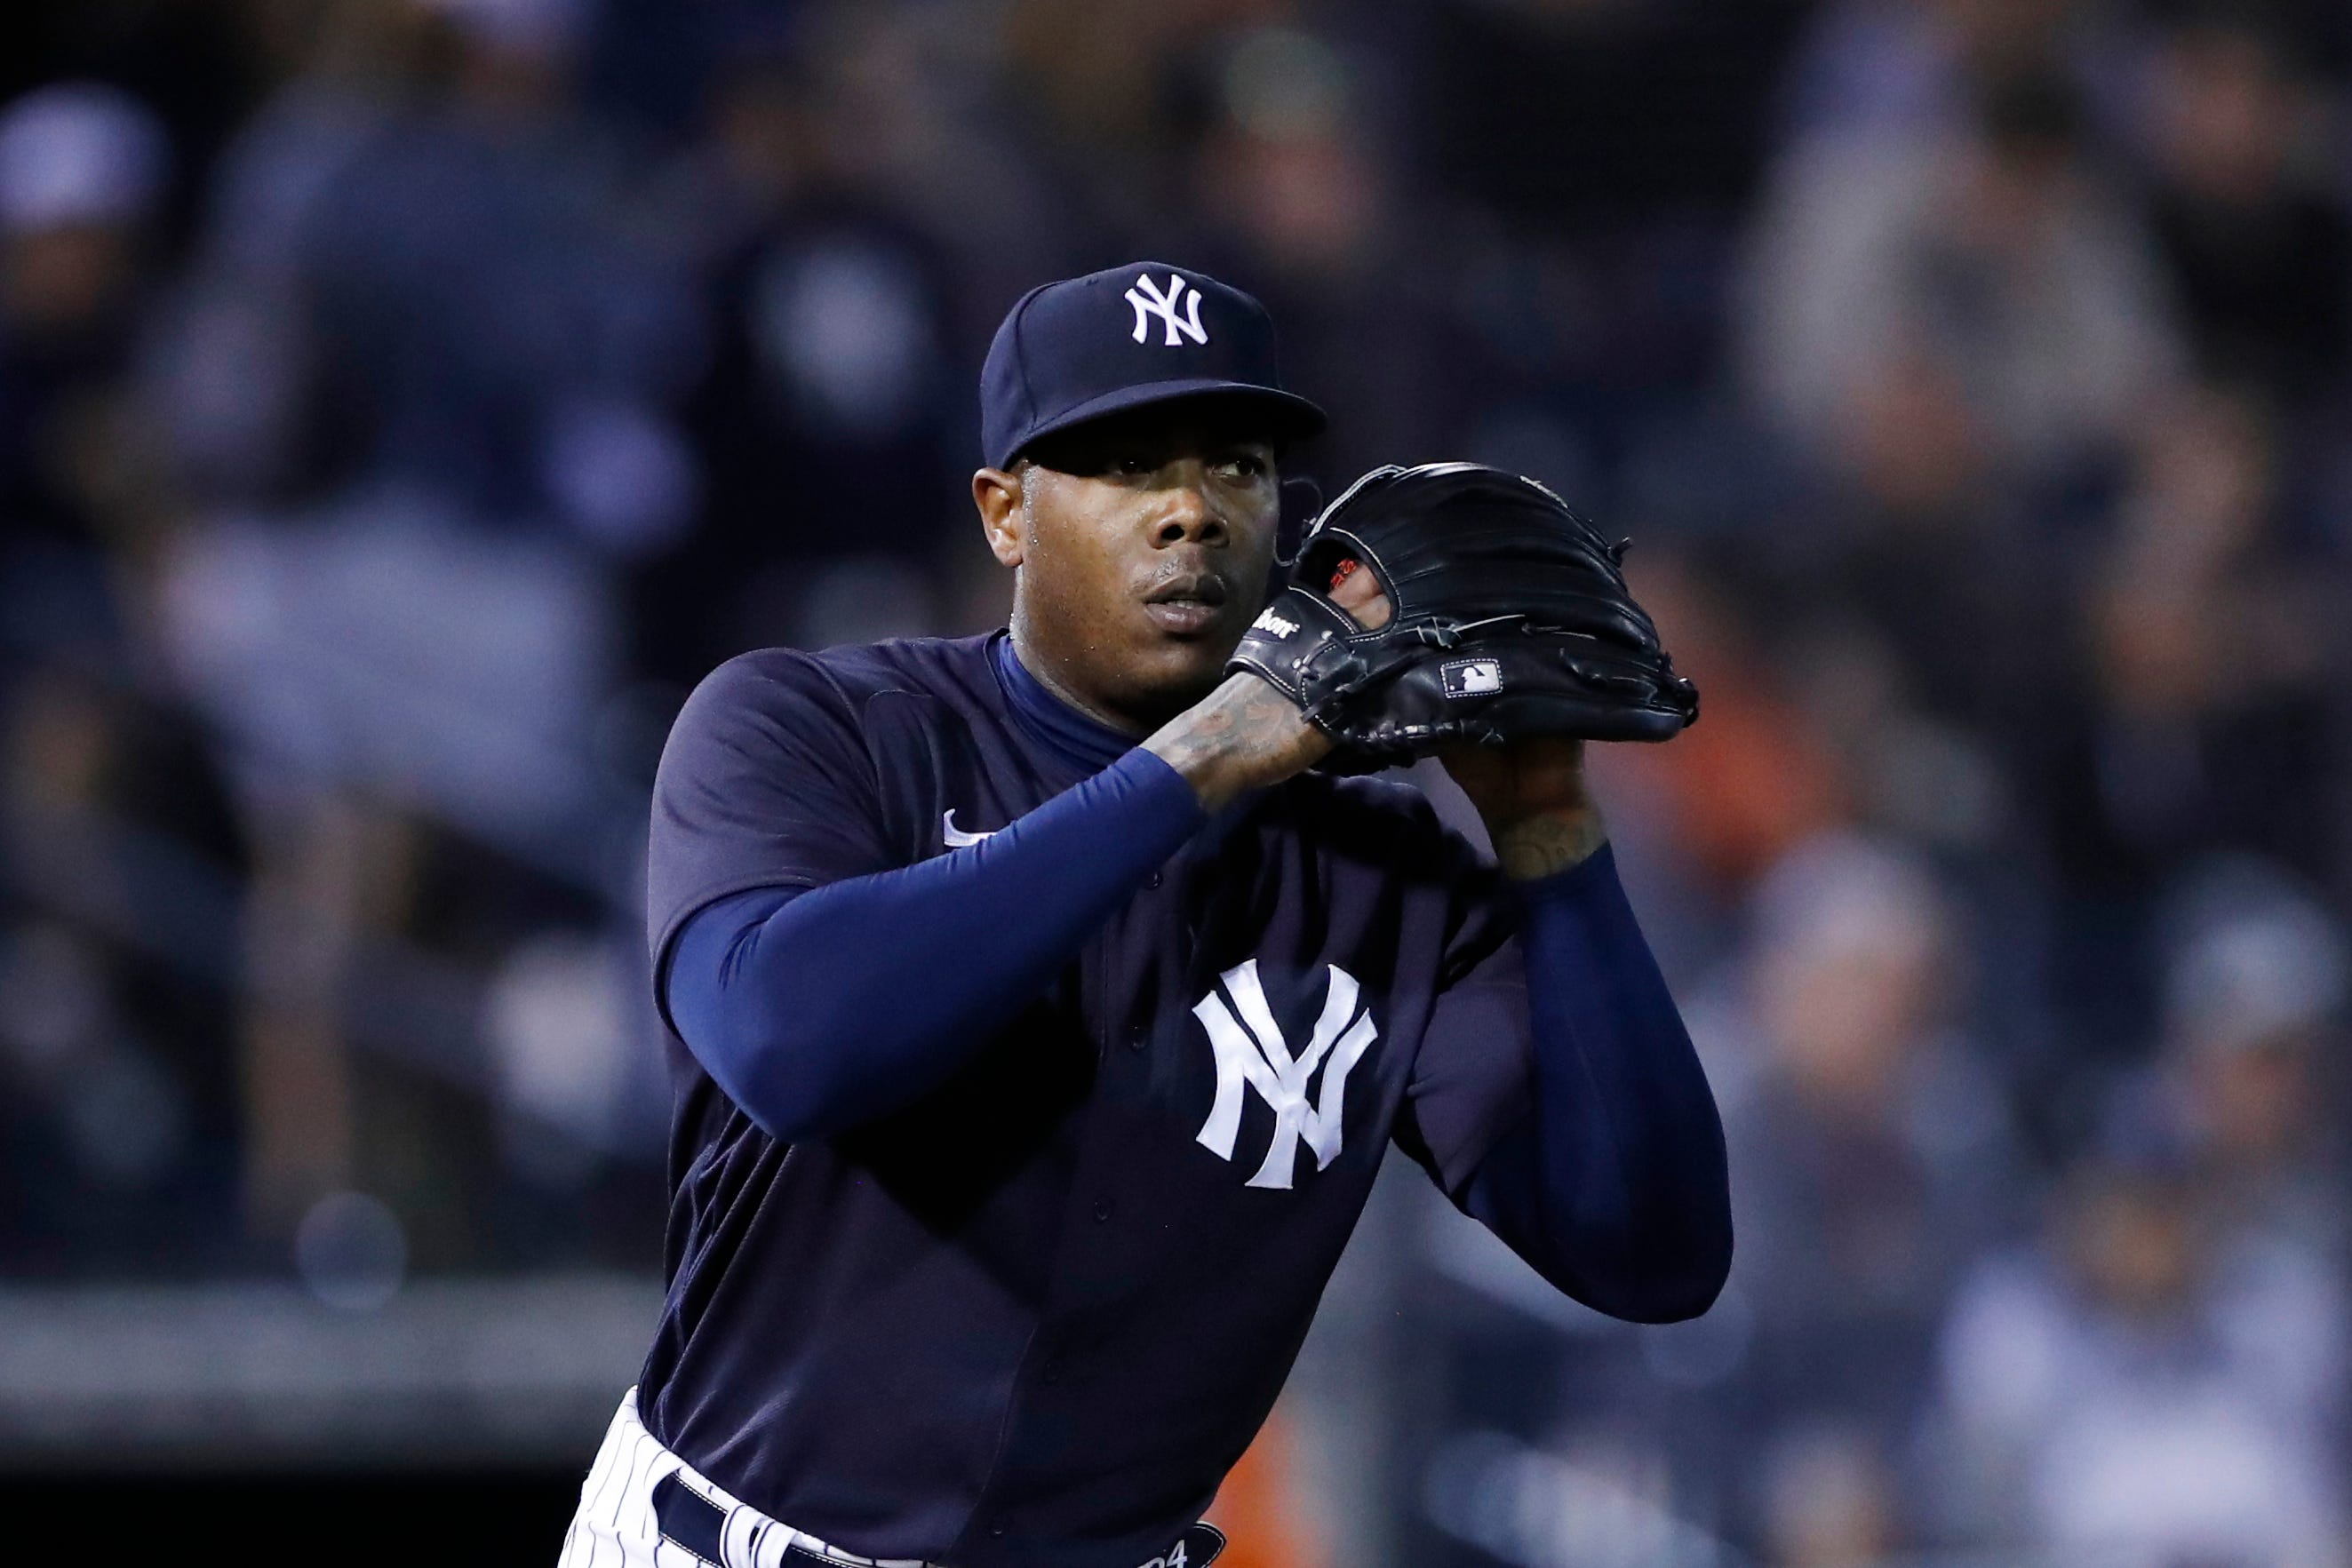 Aroldis Chapman New York Yankees Baseball Player Jersey